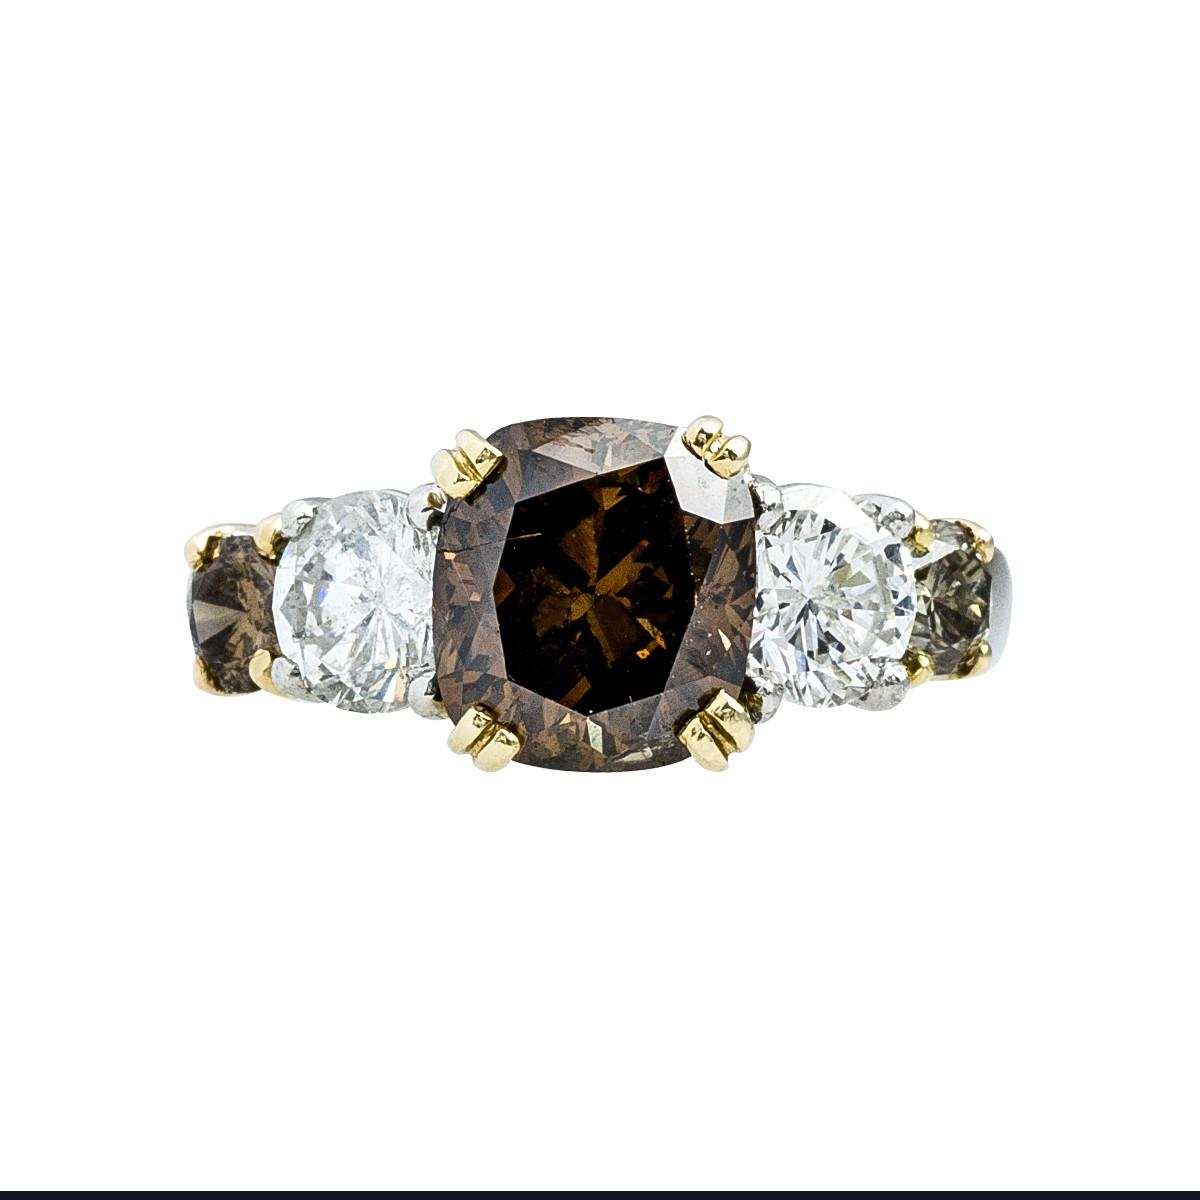 Vintage 3.85 CTW White & Brown Diamond Ring